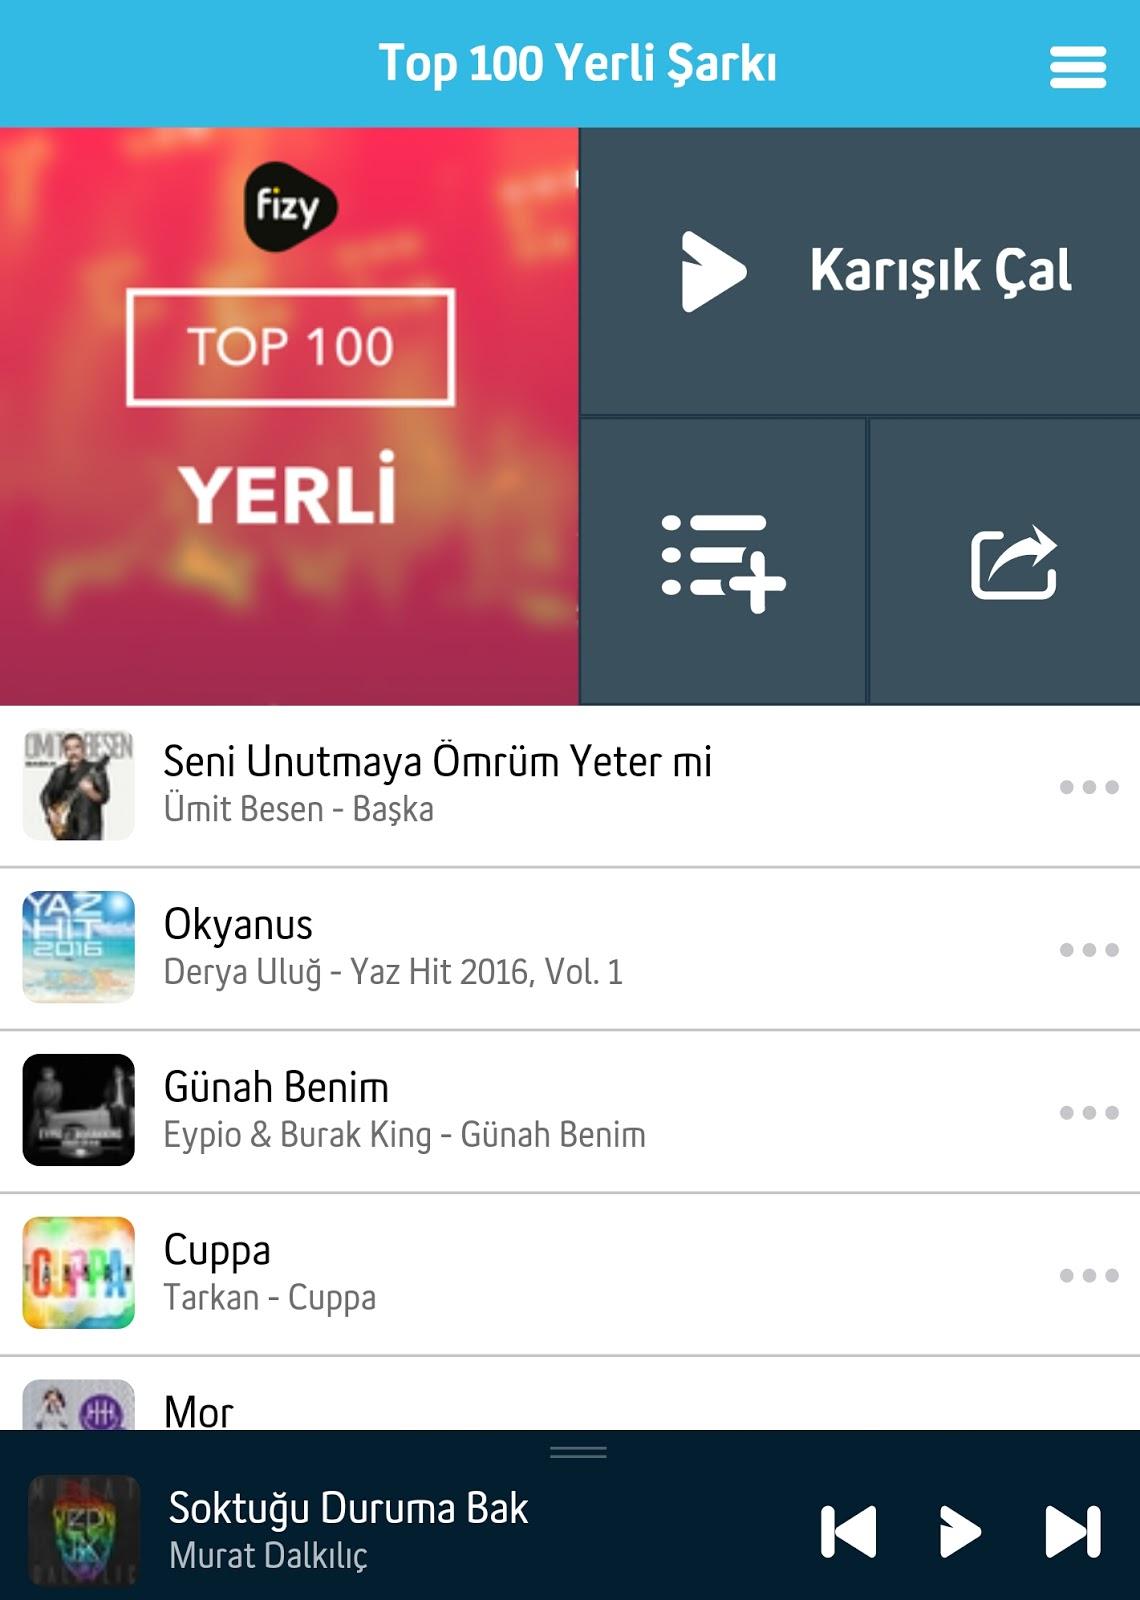 Top 15 itunes singles chart